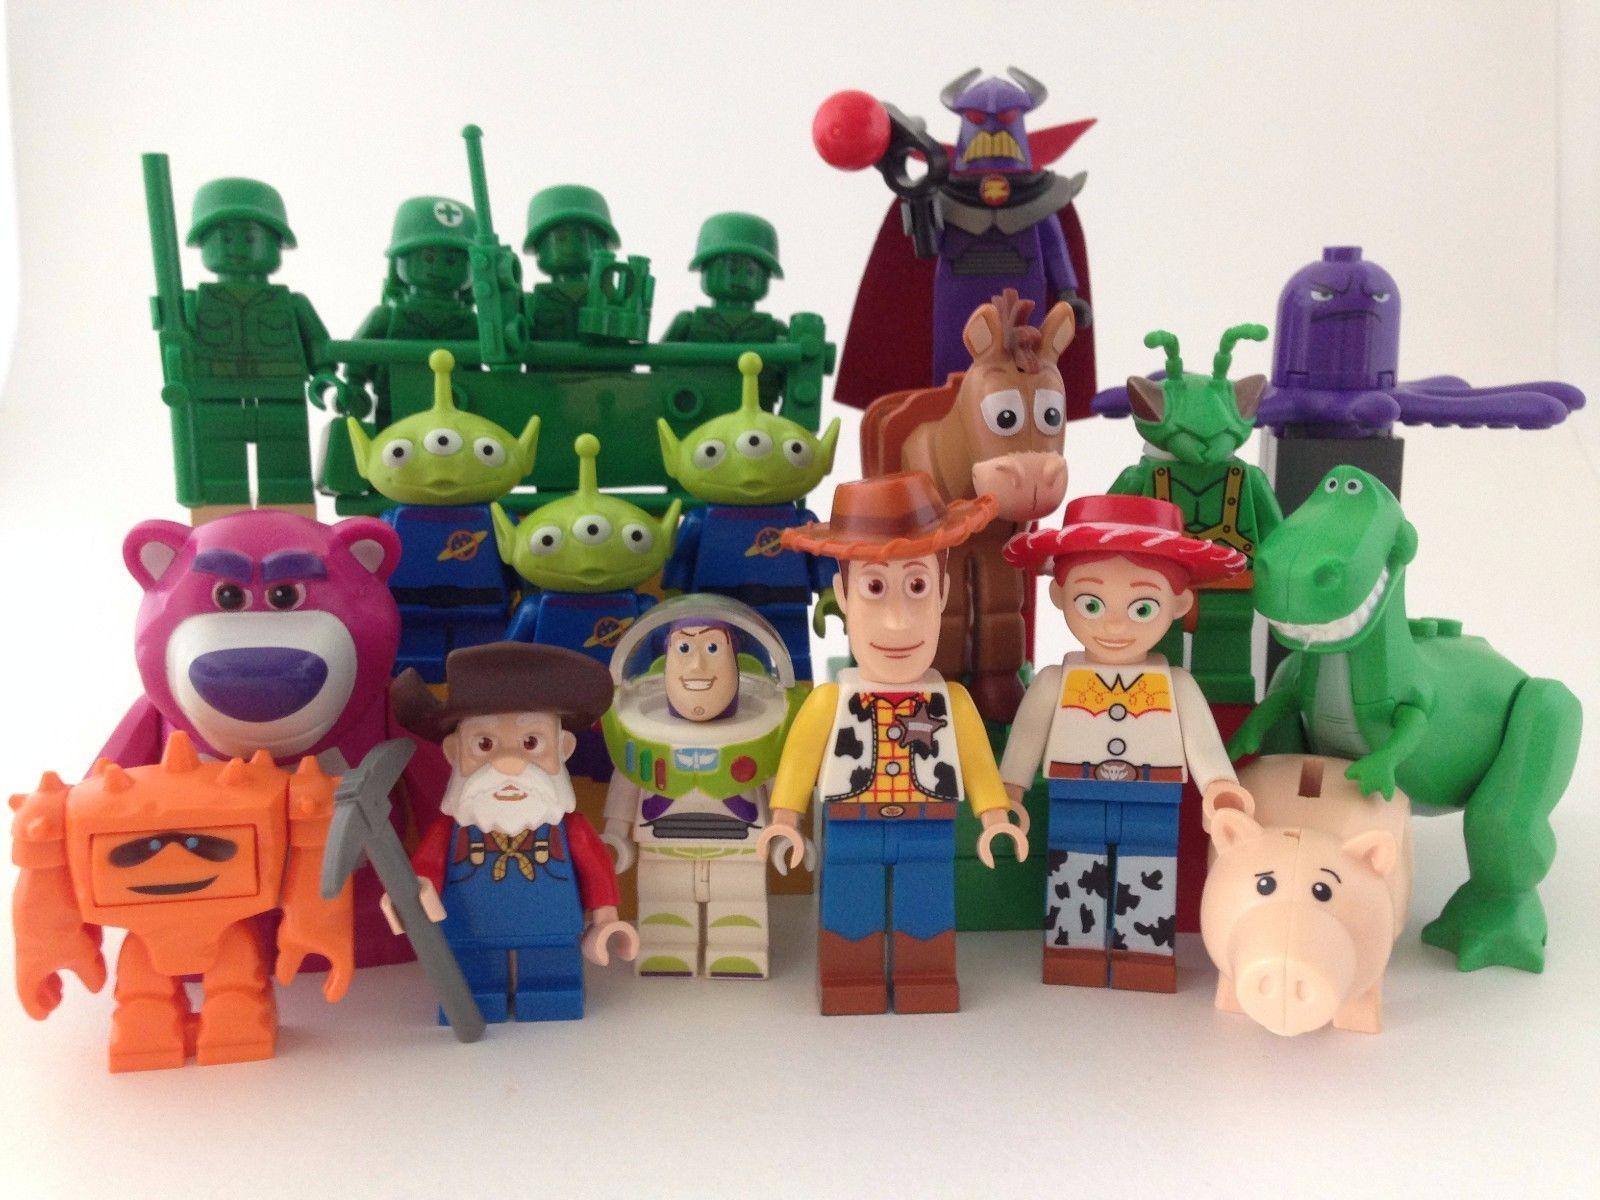 LEGO STAR WARS Minifigures 4 Figures ONLY PER LOT READ DESCRIPTION All Random